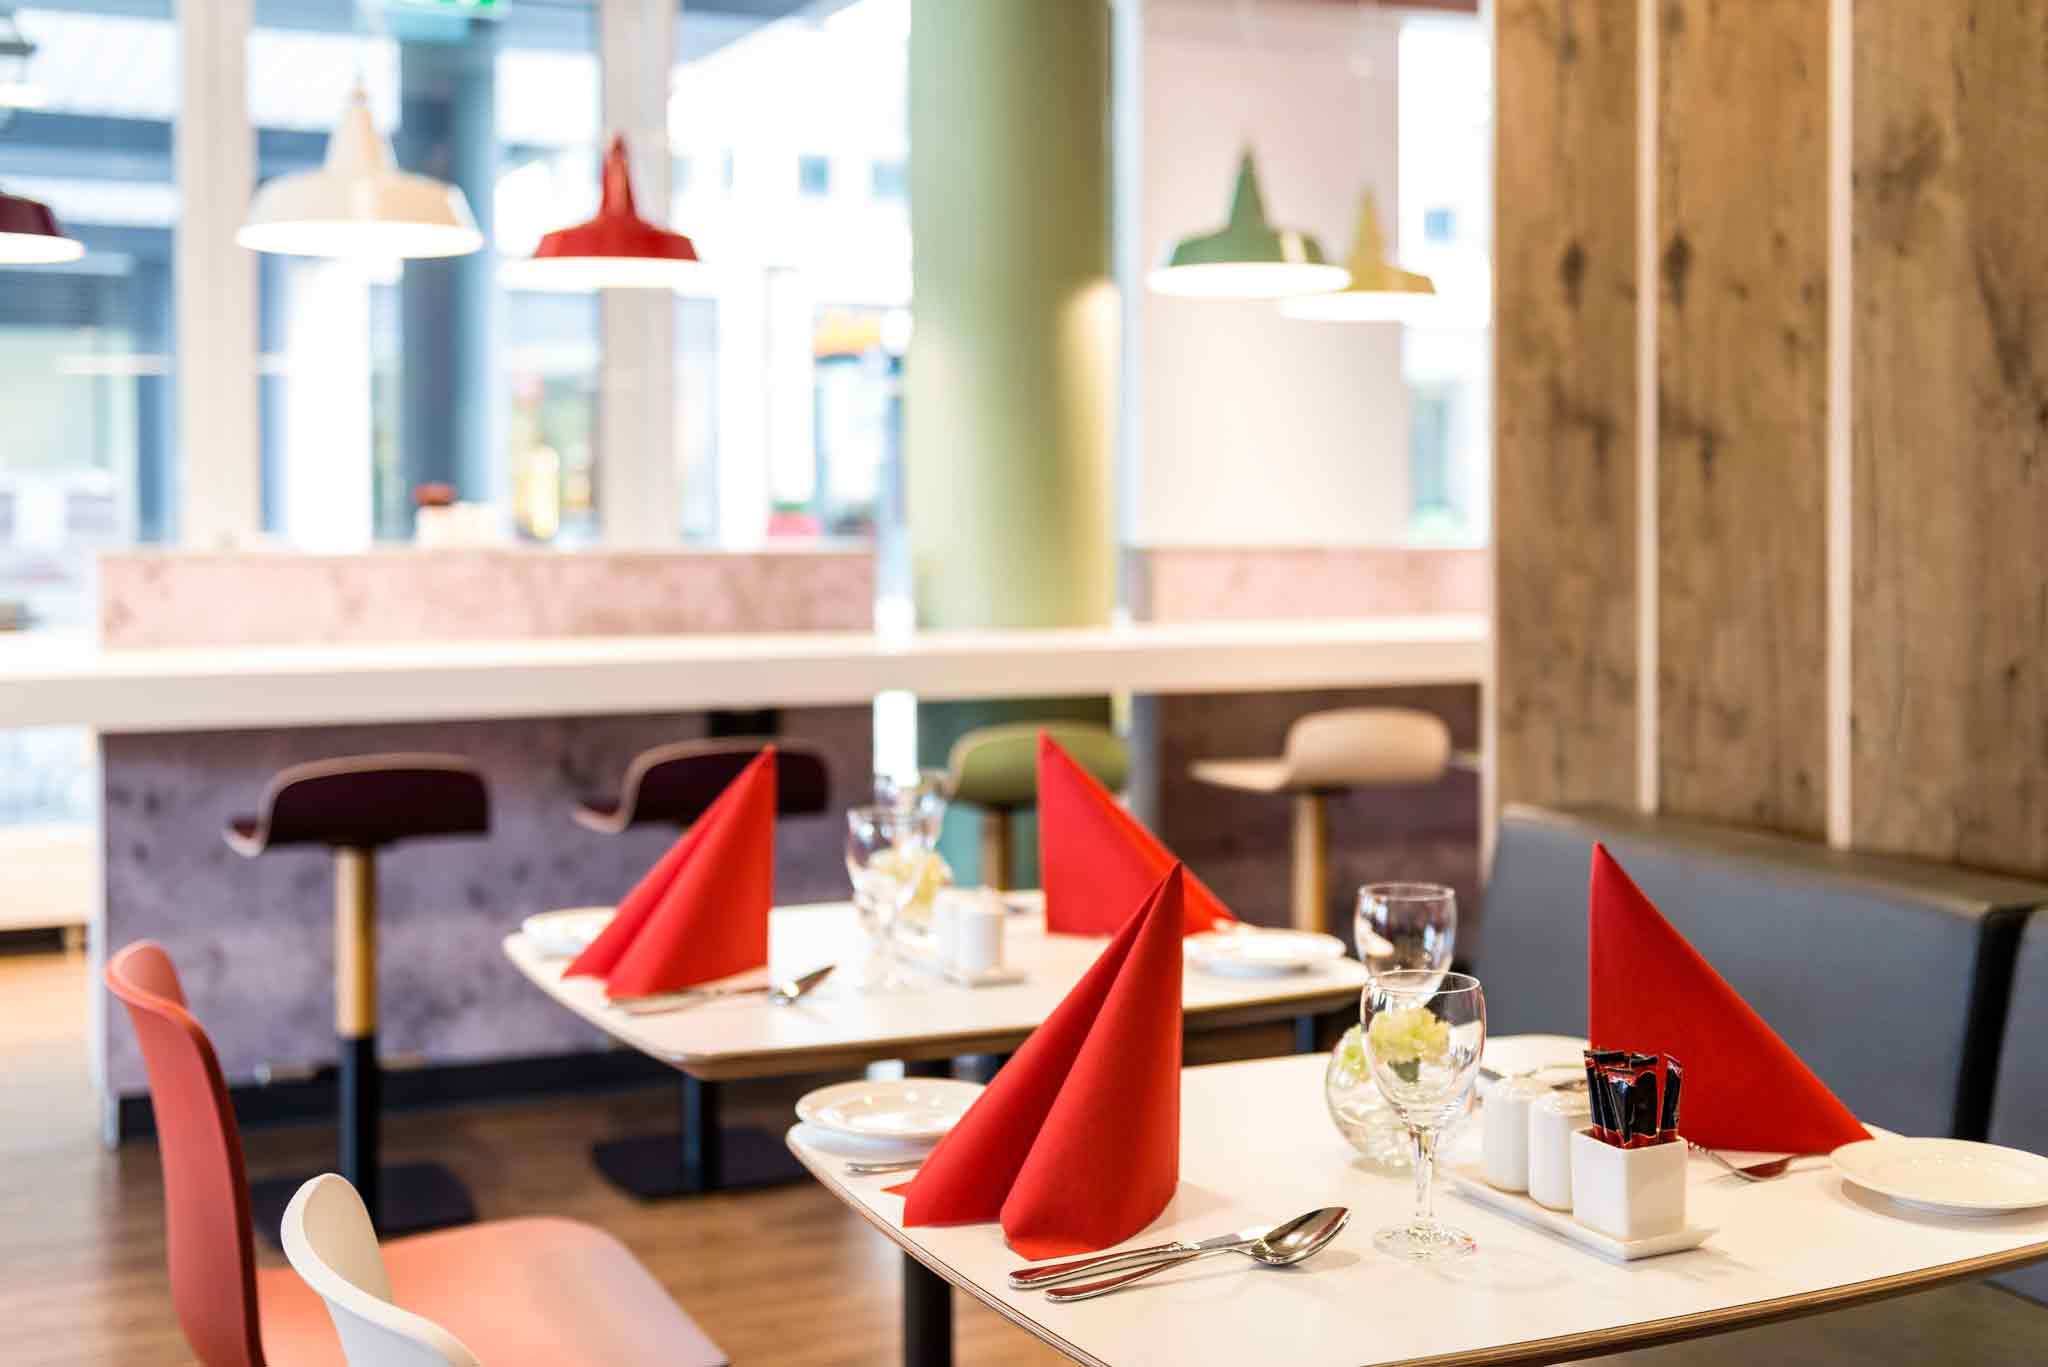 Ibis Hotel München Parkstadt Schwabing Gastronomy